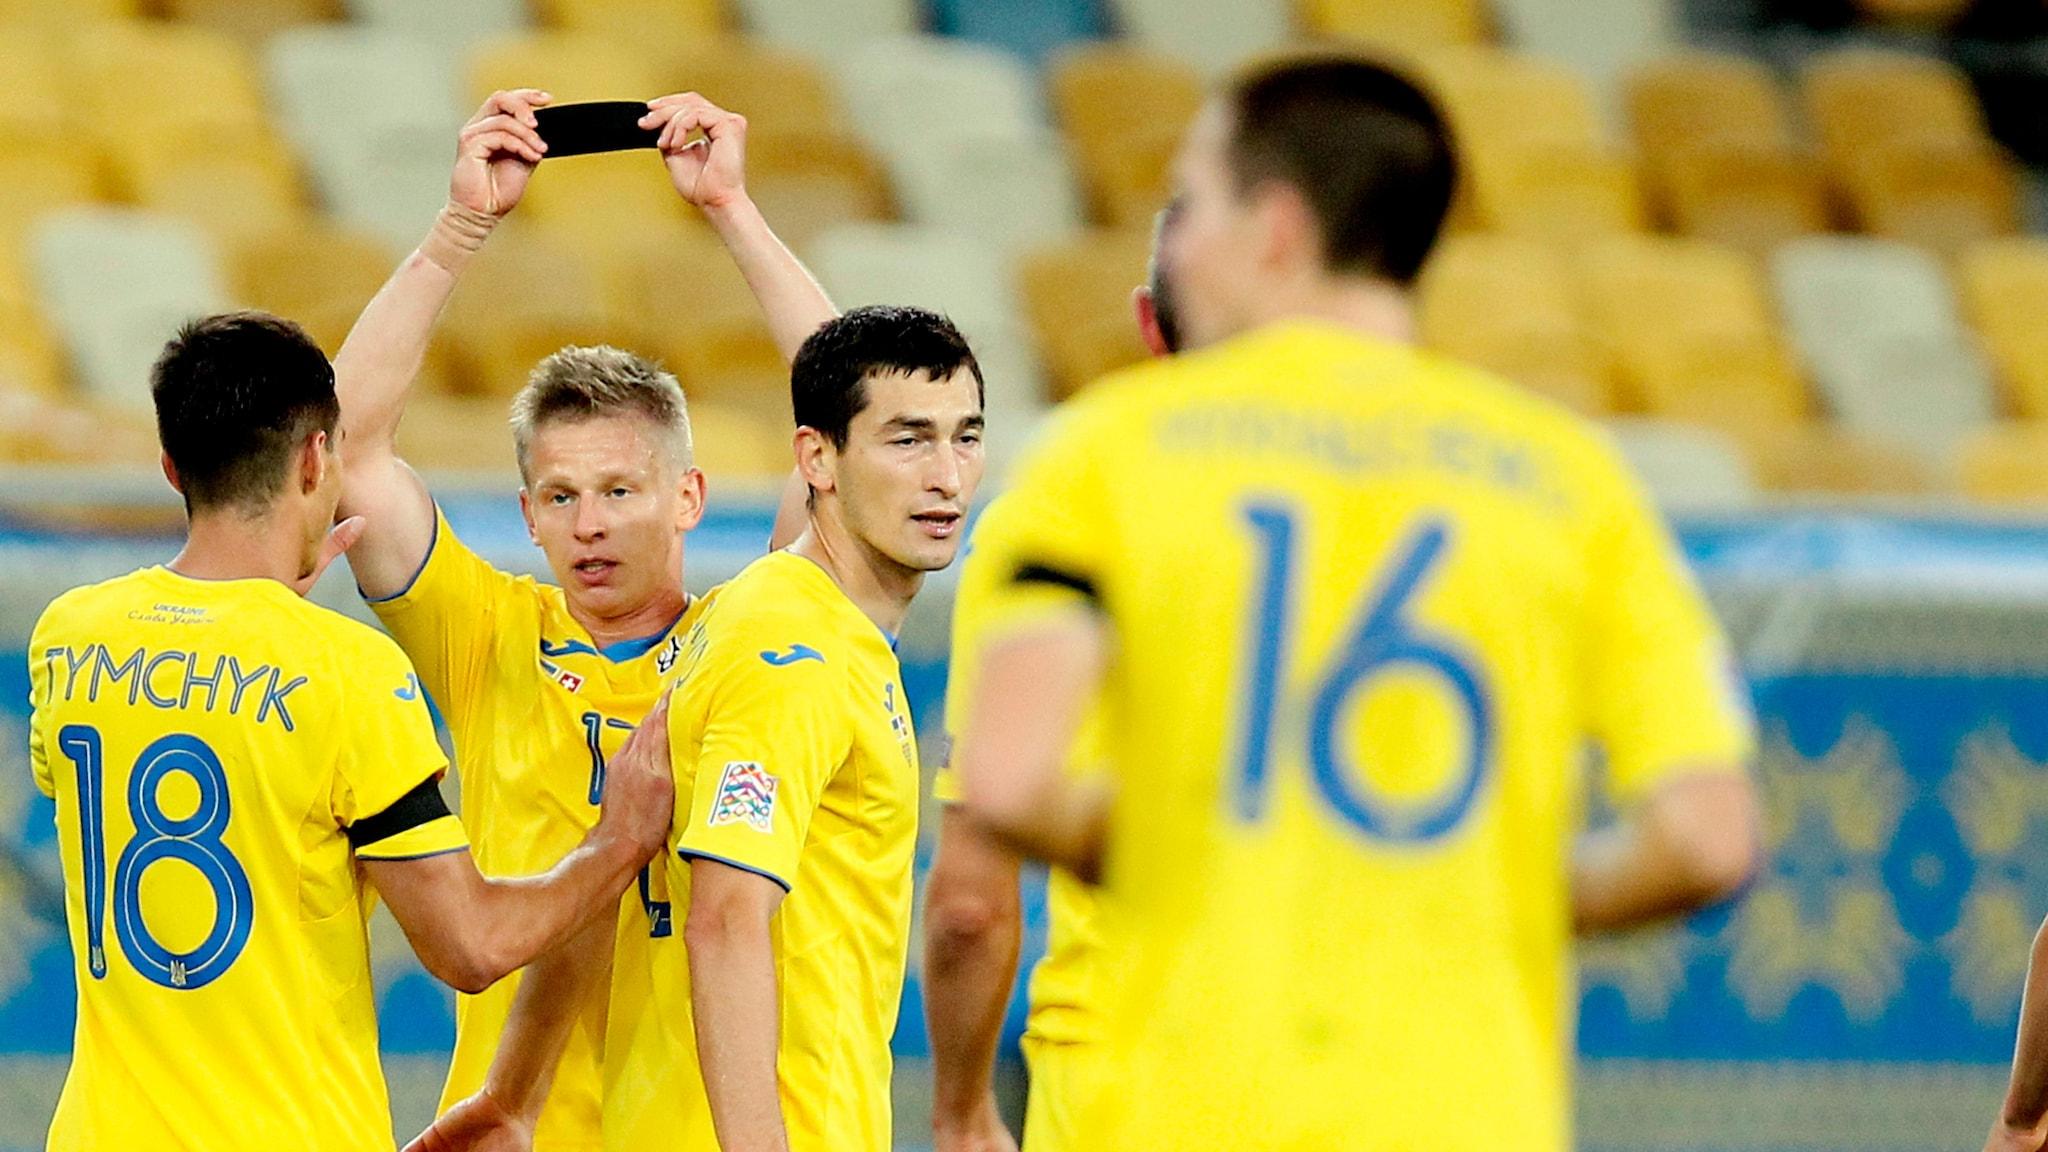 Ukraine 2-1 Switzerland: report